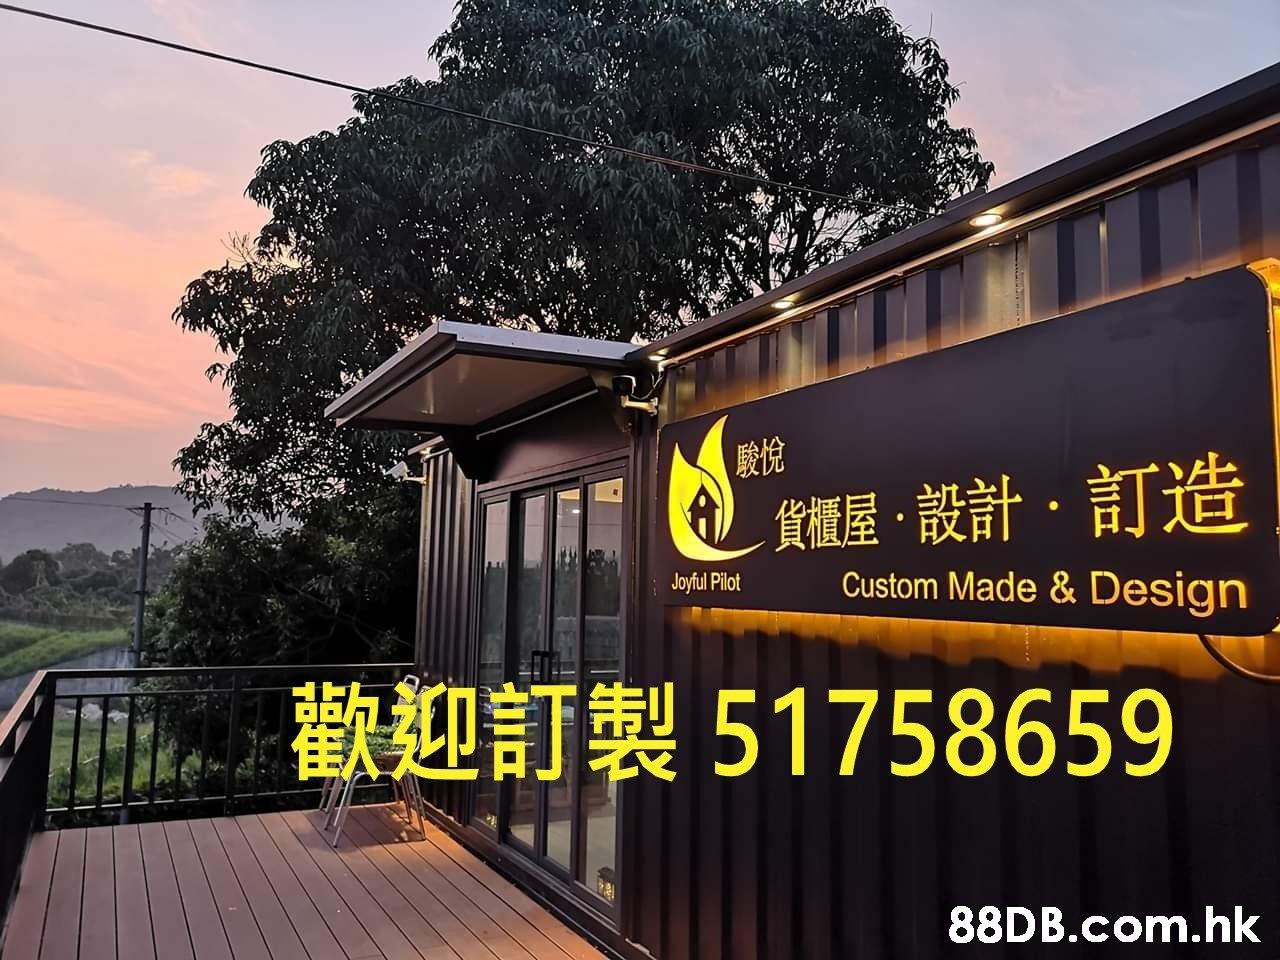 貨櫃屋,設計,訂造 Custom Made & Design Joyful Pilot 歡迎訂製51758659 .hk  Sky,House,Property,Home,Font